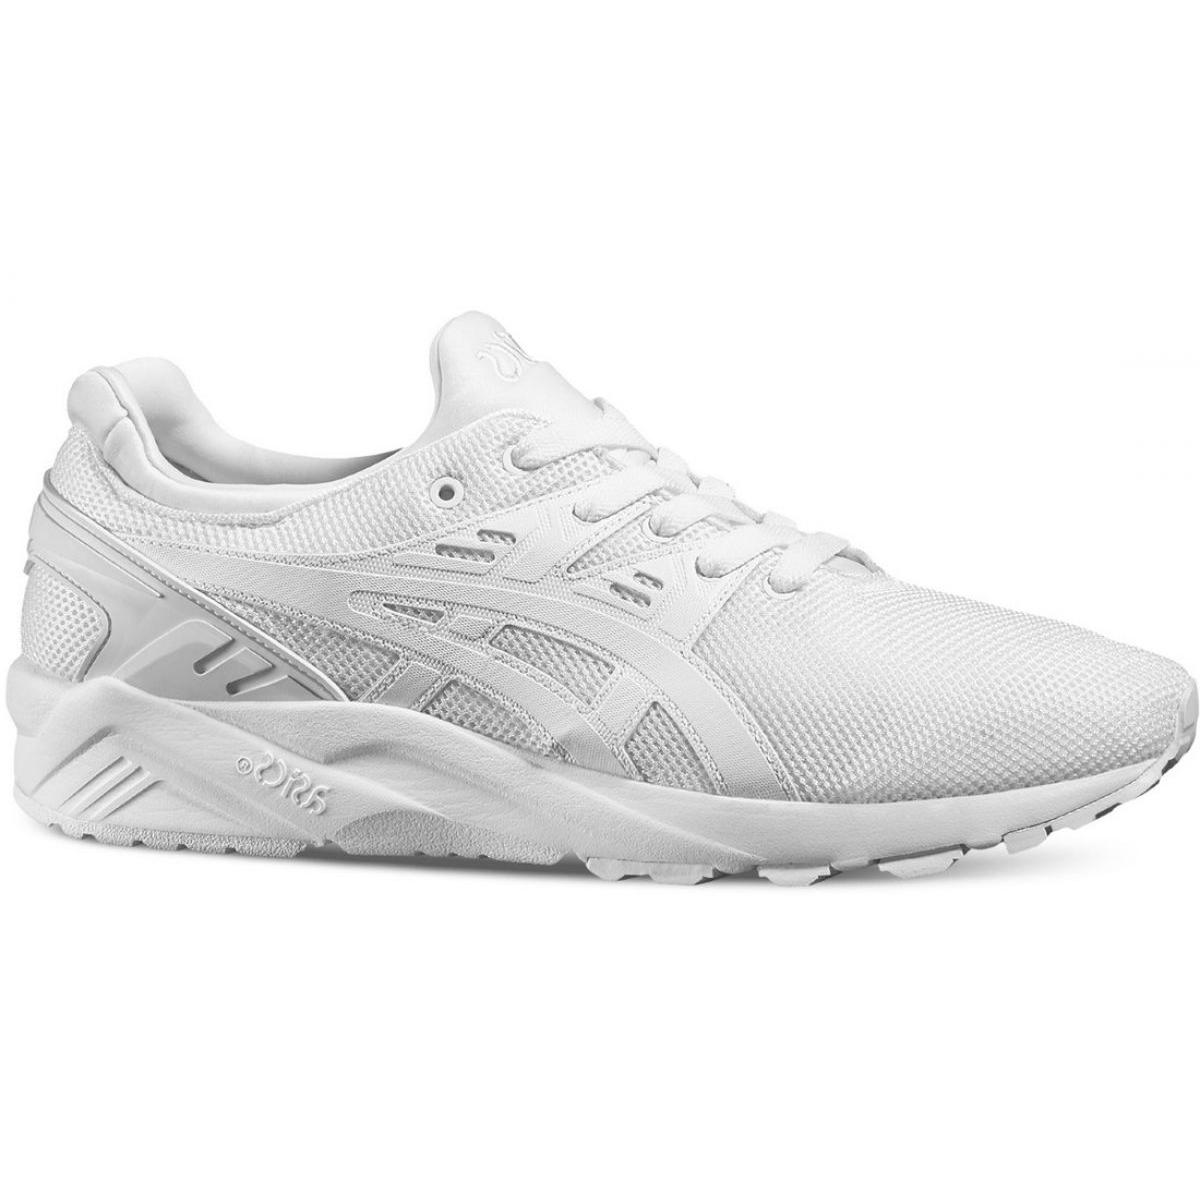 gel kayano trainer evo white